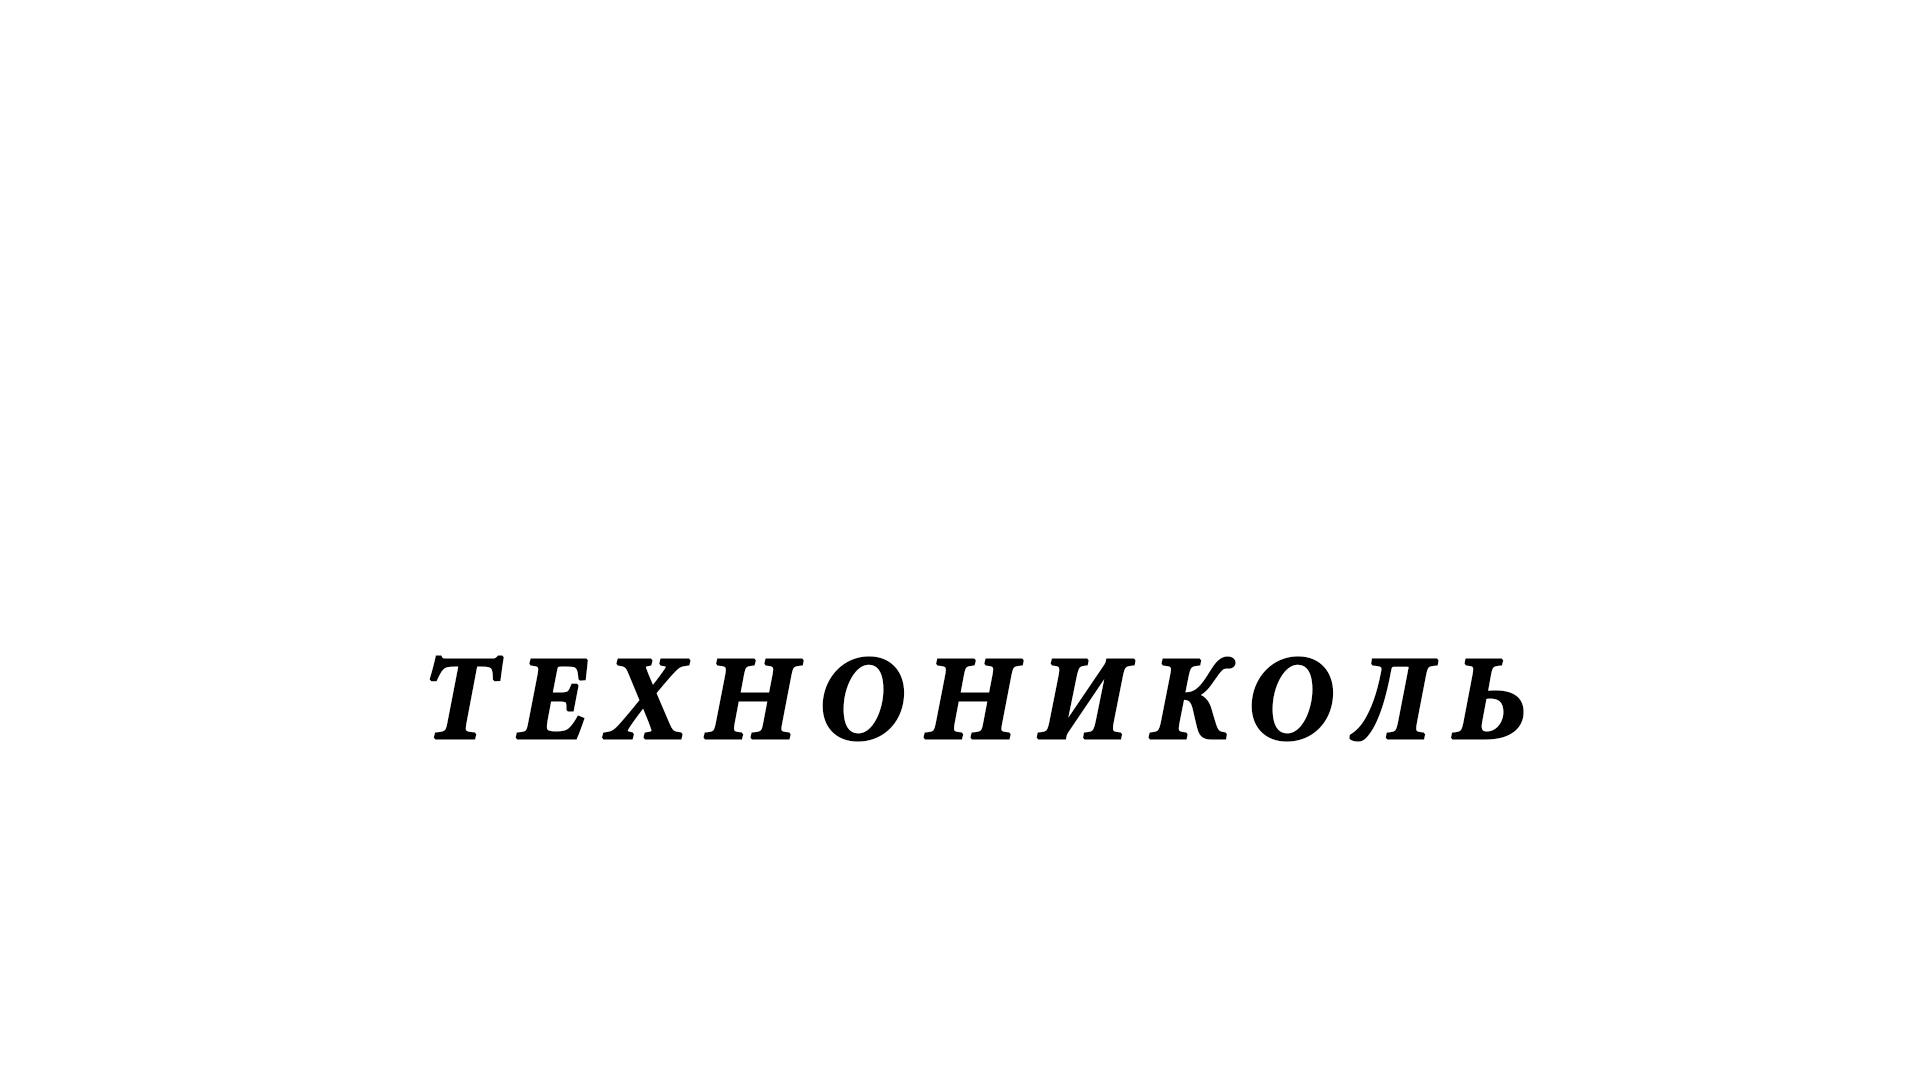 Каменная вата - ТЕХНОНИКОЛЬ